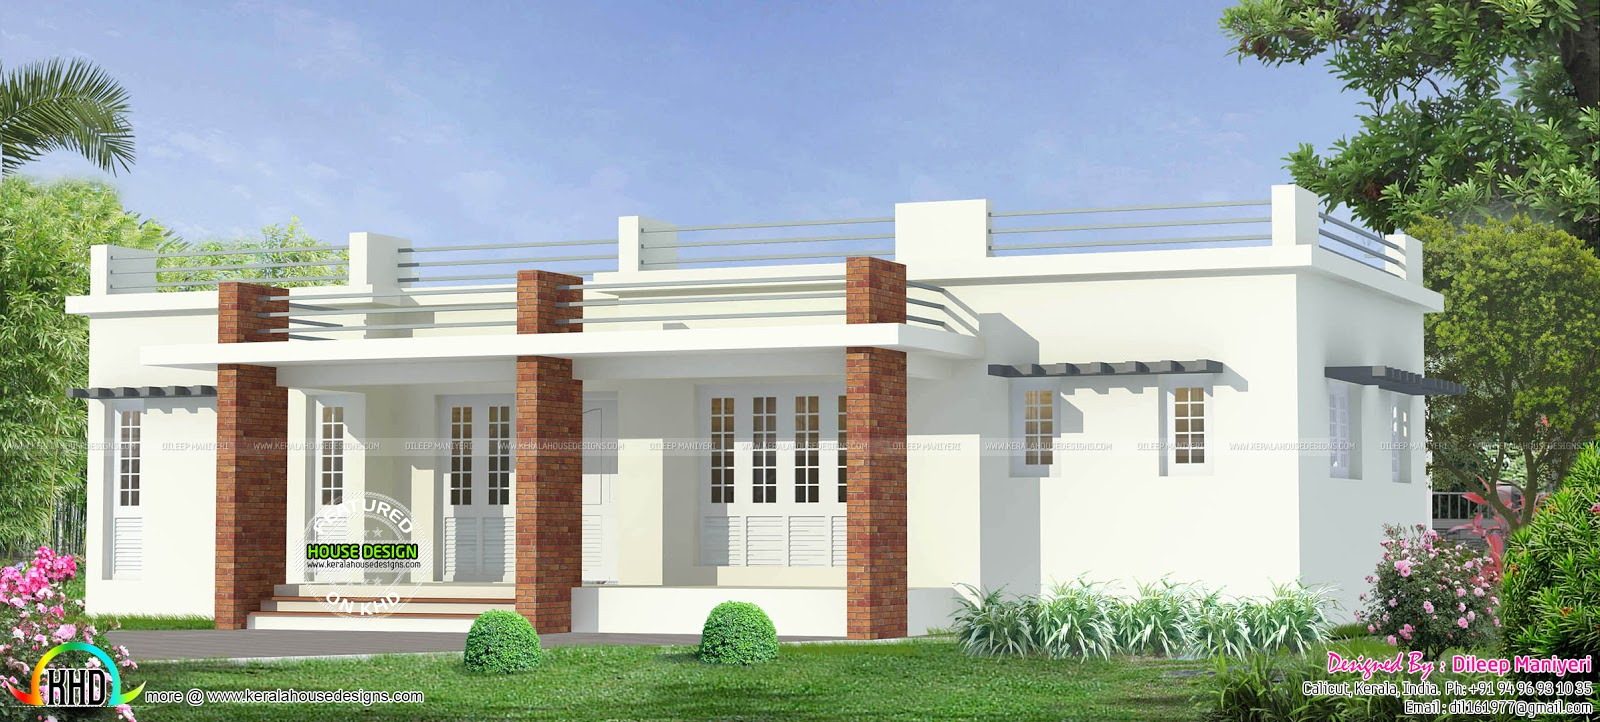 Front Elevation Of Flat Roof Houses : Single floor house elevation models paint design